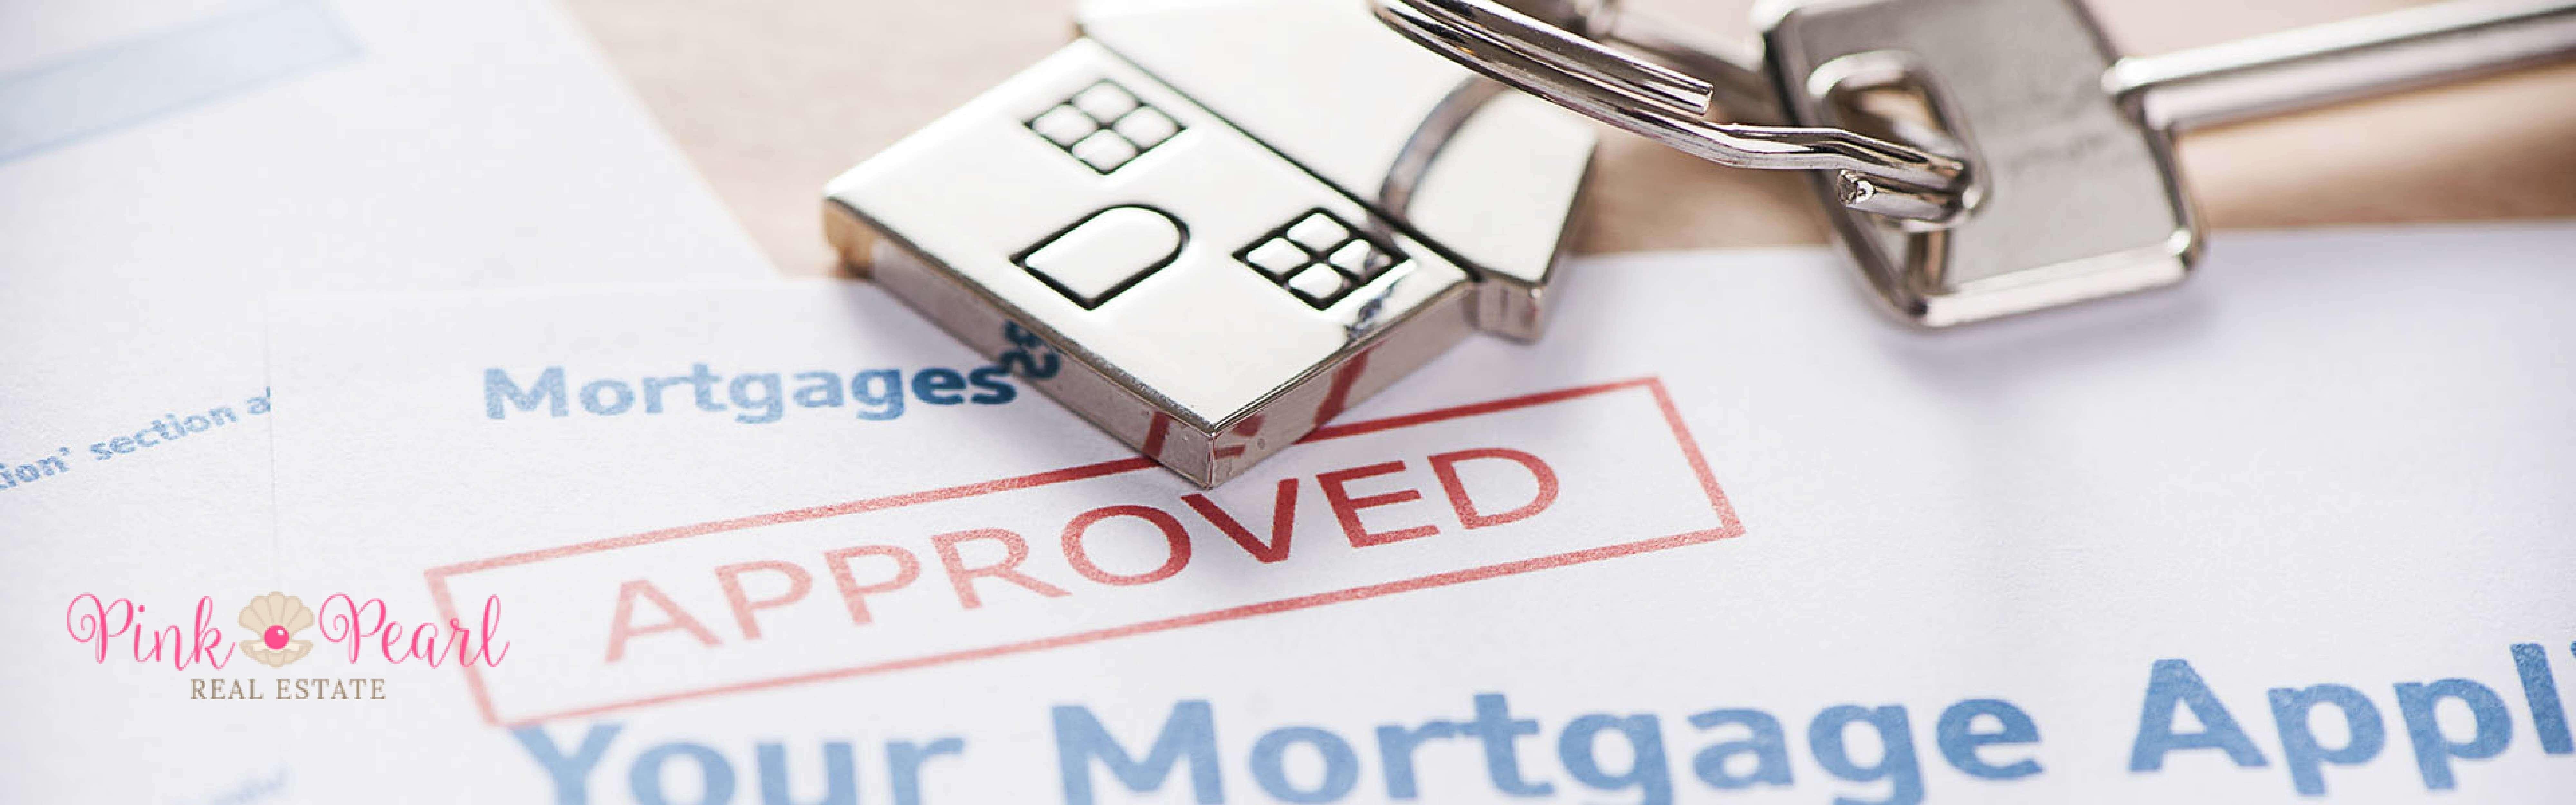 Choosing the right mortgage lender in Virginia Beach